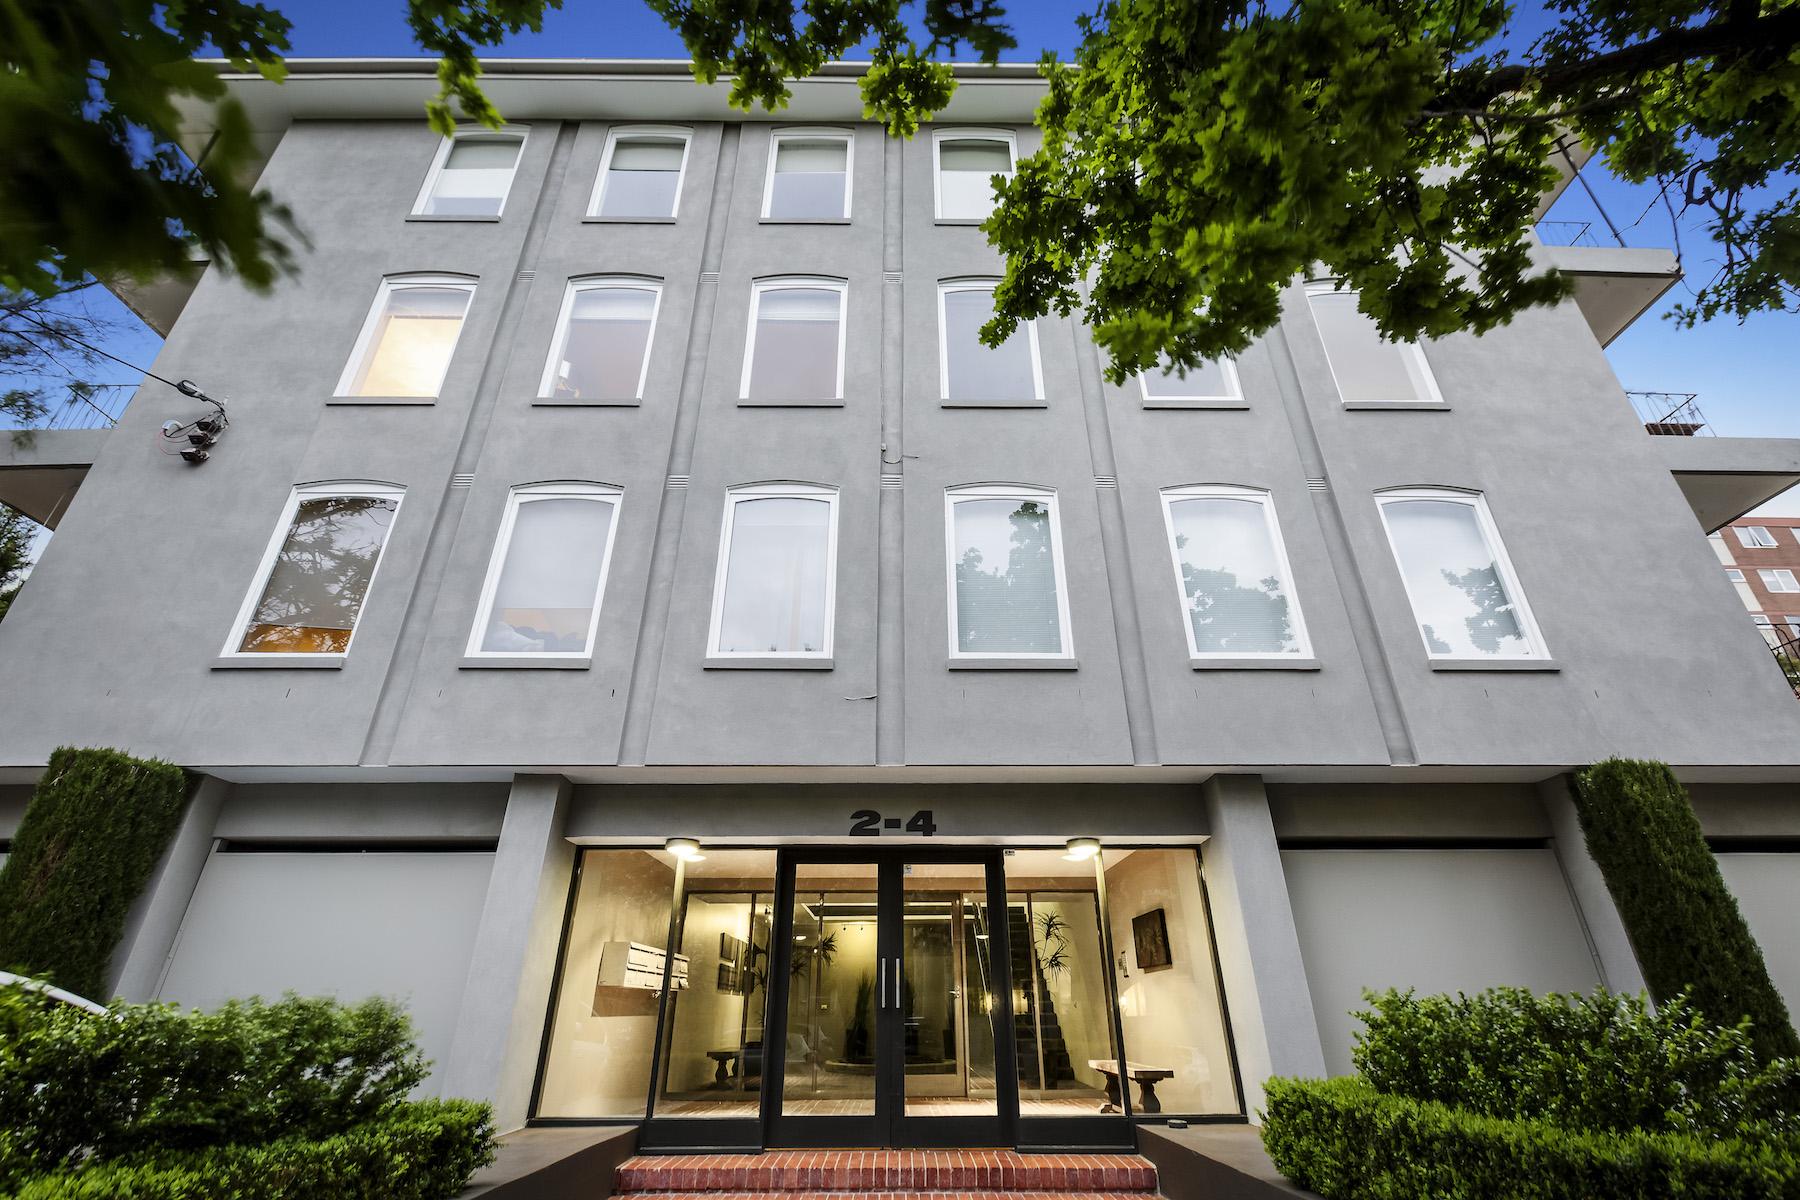 Tek Ailelik Ev için Satış at 1 at 2-4 Kensington Road, South Yarra 1 at 2 Kensington Road Melbourne, Victoria, 3141 Avustralya